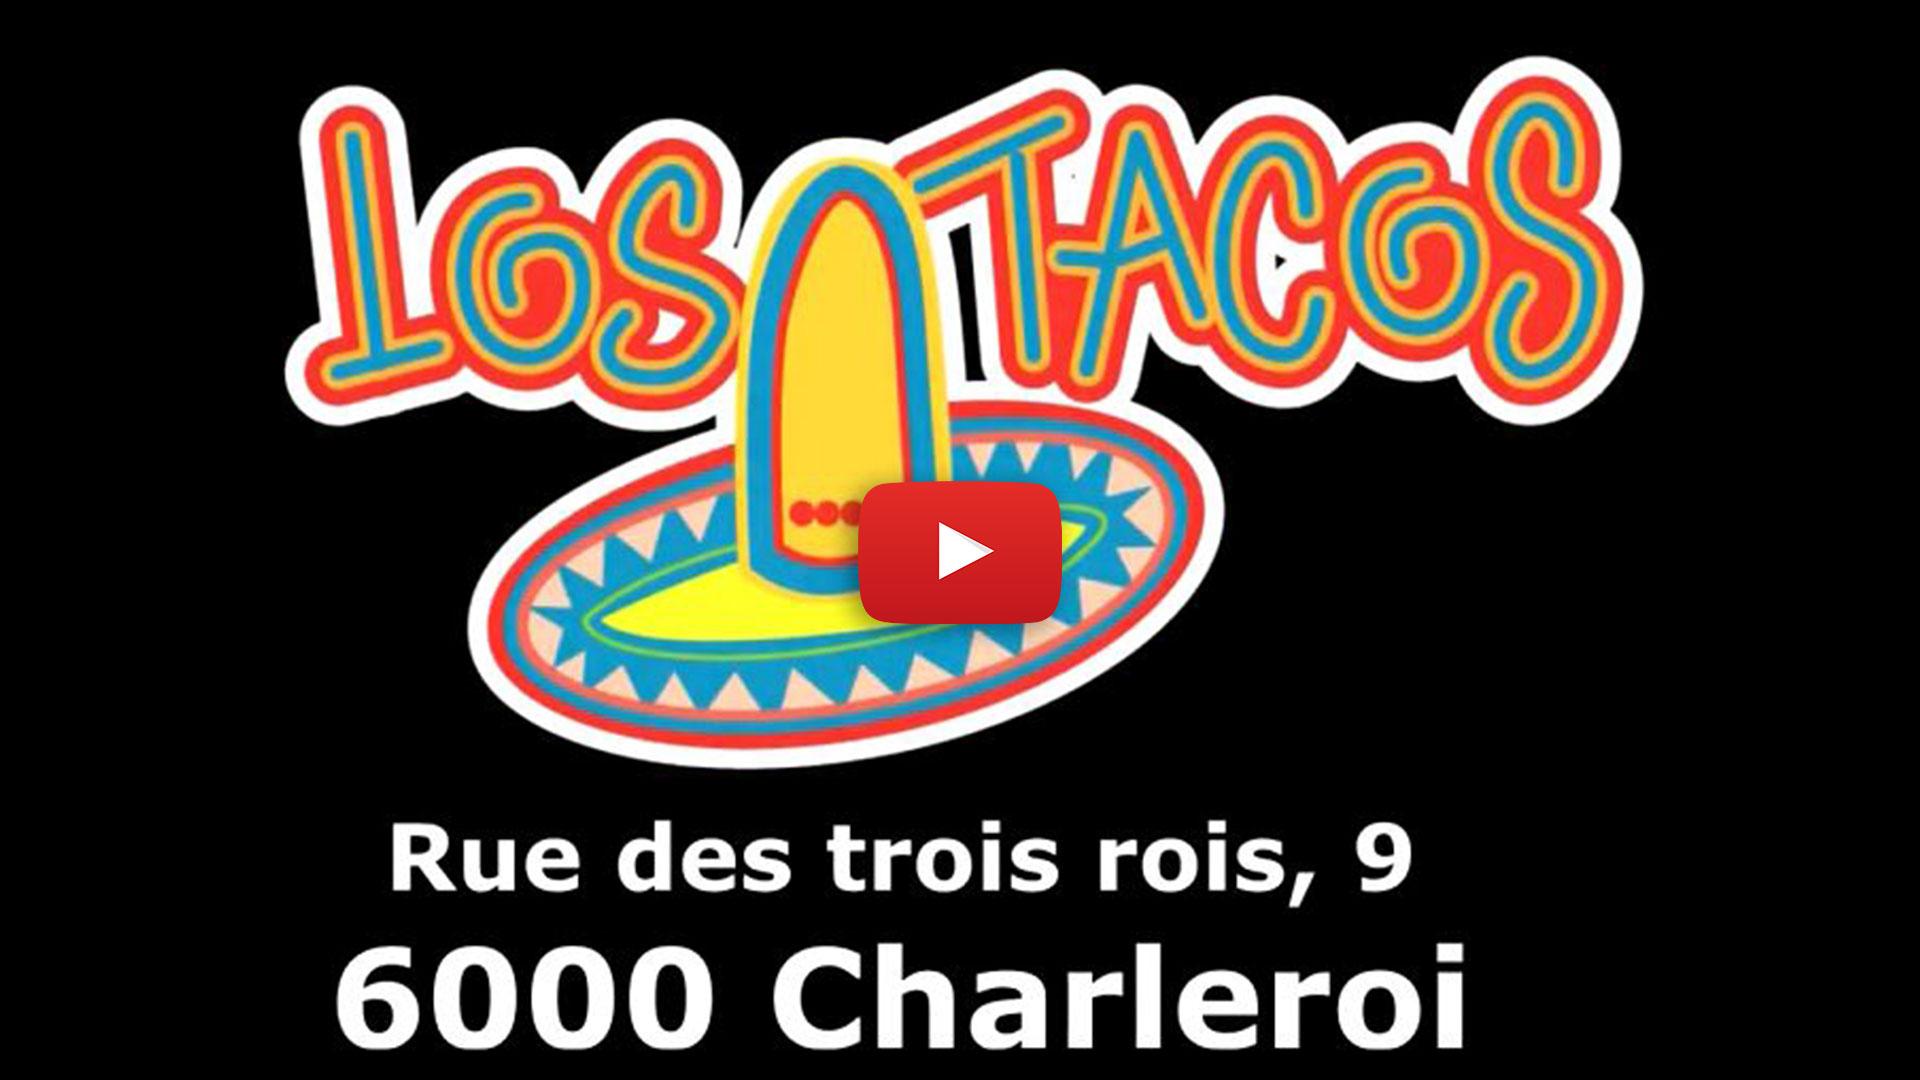 los-tacos-charleroi.jpg